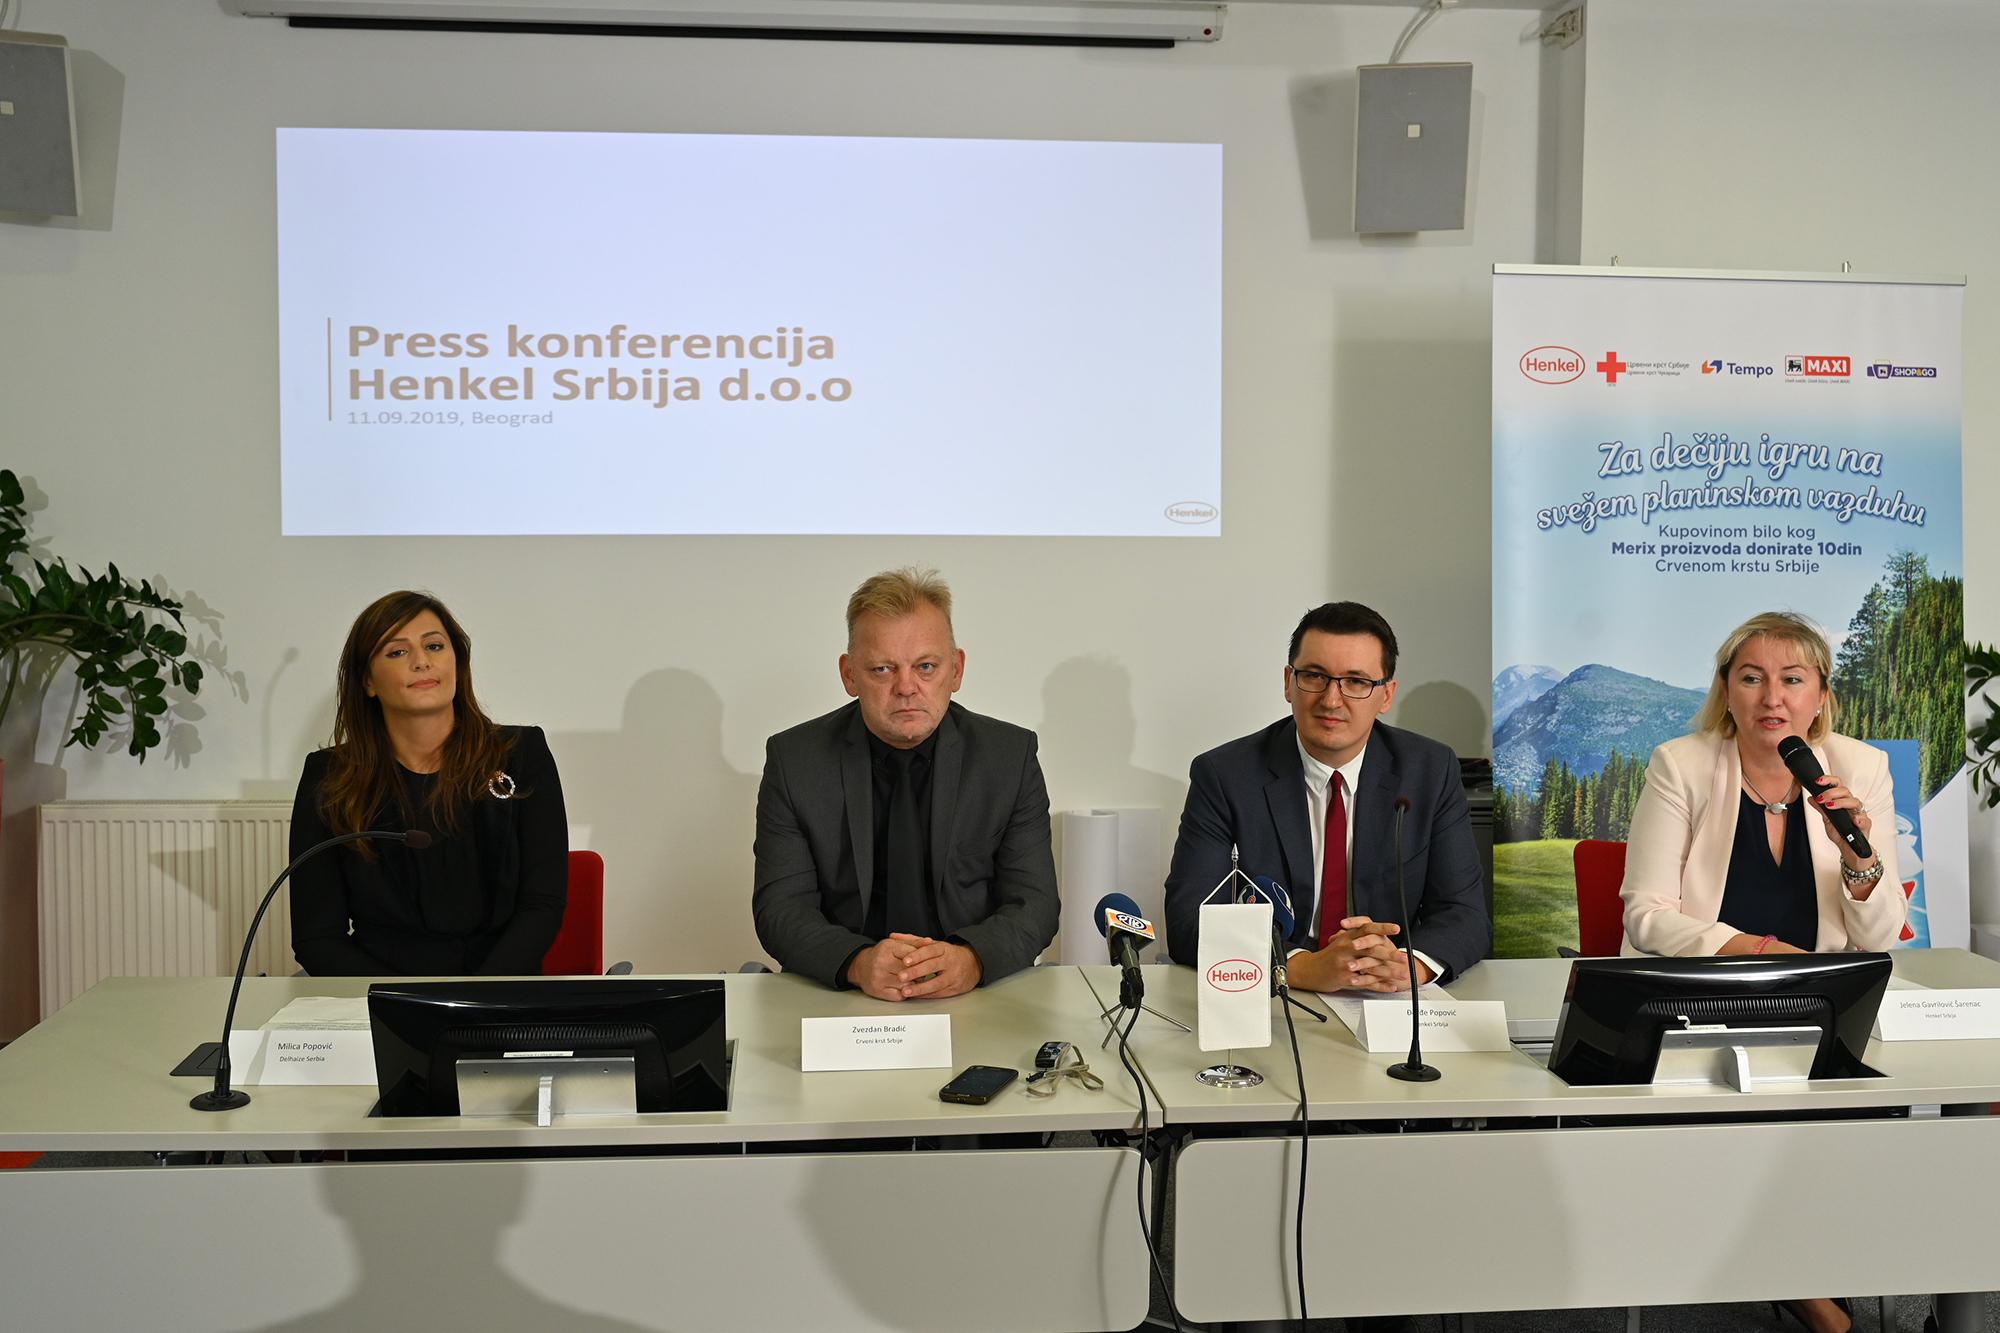 Konferencija za medije kompanija Henkel